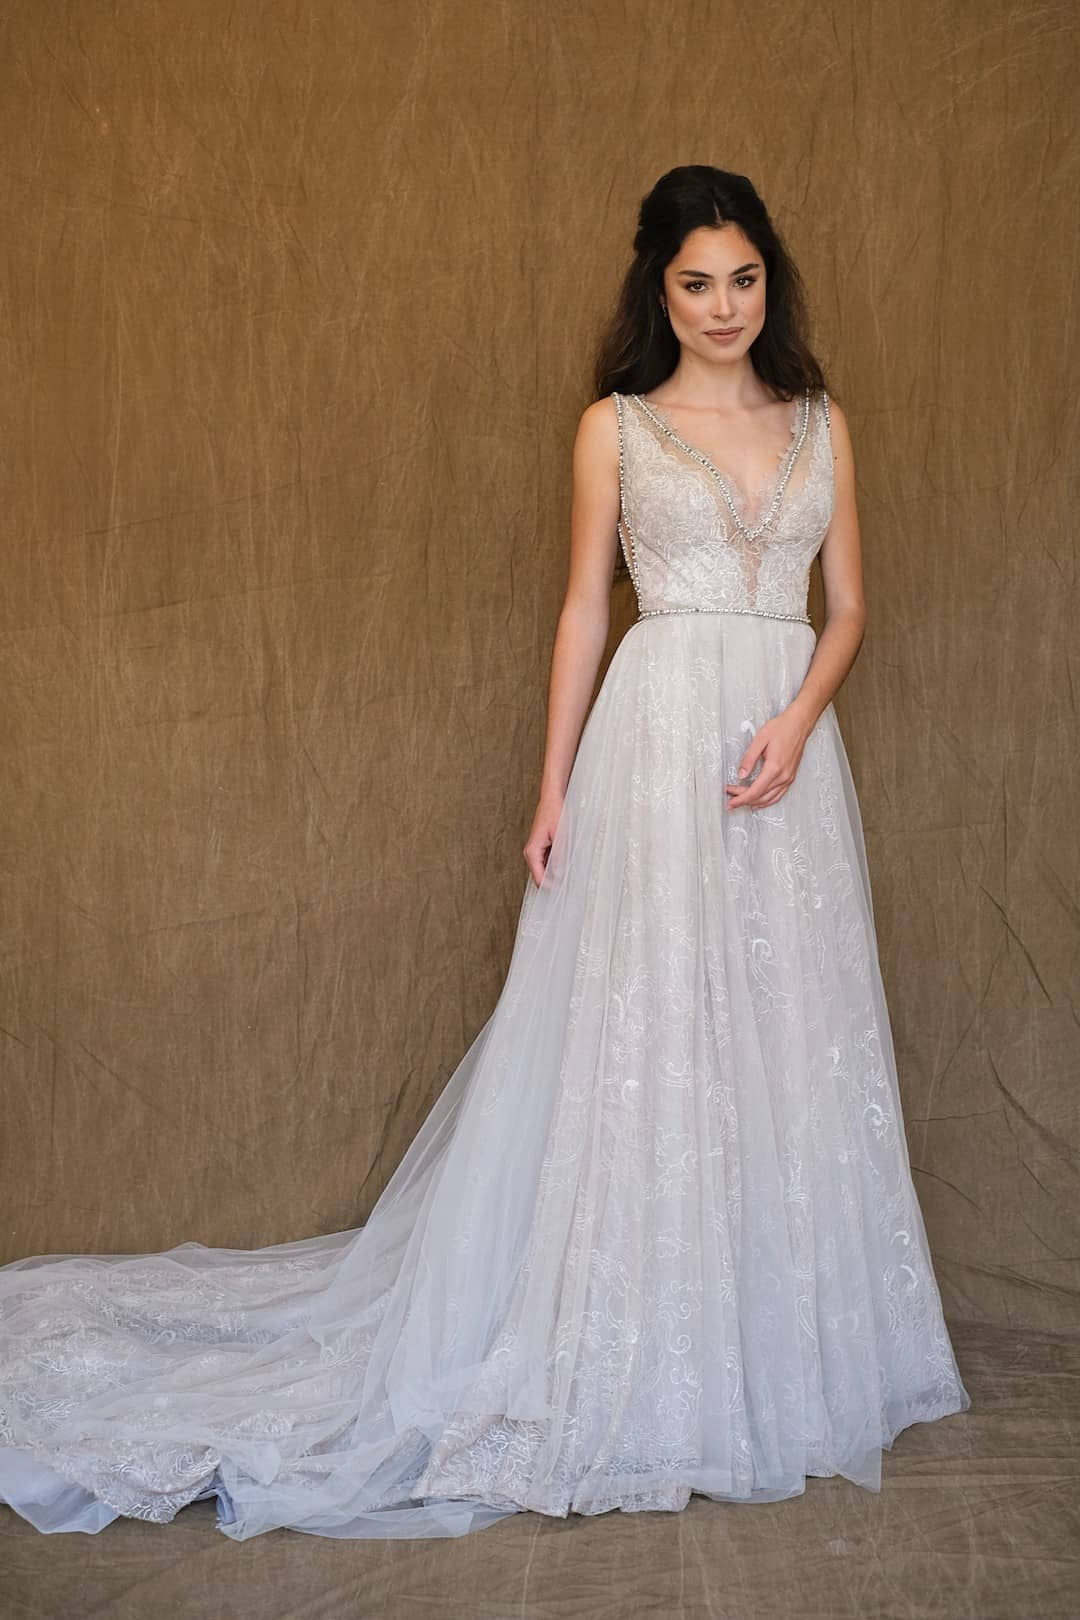 Wedding dresses on sale in Bratislava - Galia Lahav - Gala 711 - front